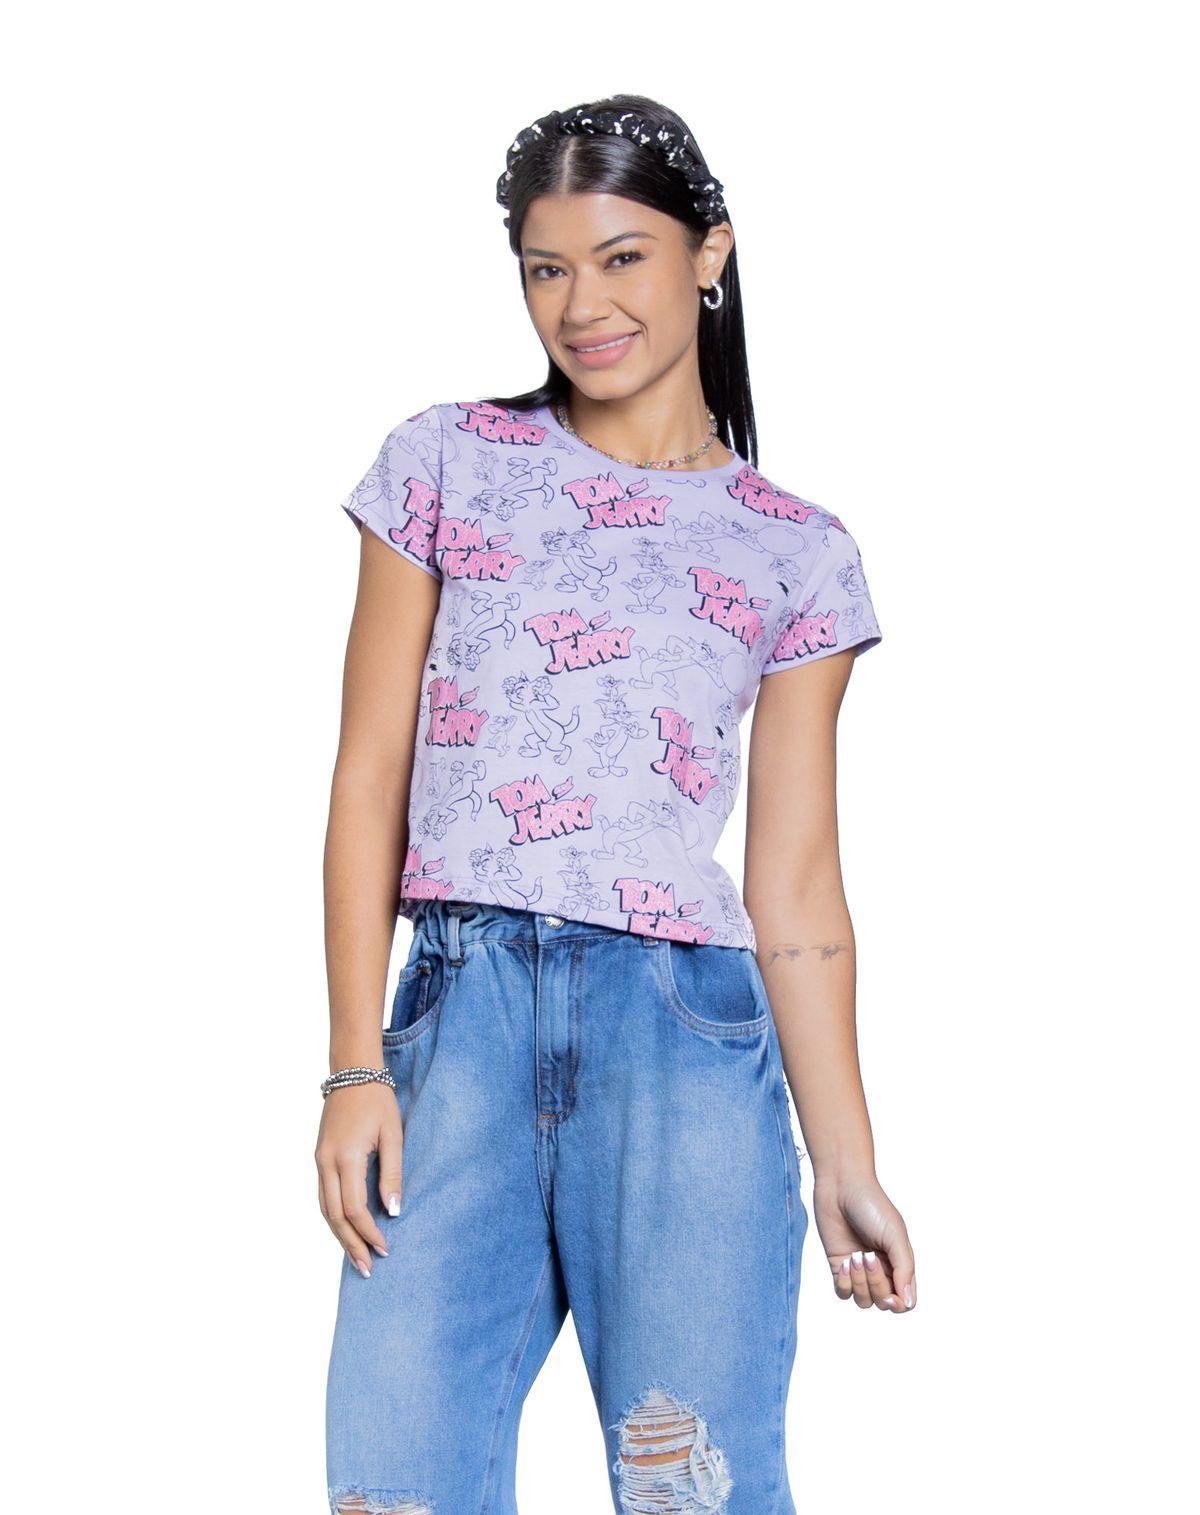 590983003-camiseta-manga-curta-feminina-tom-e-jerry-glitter-lilas-g-c74